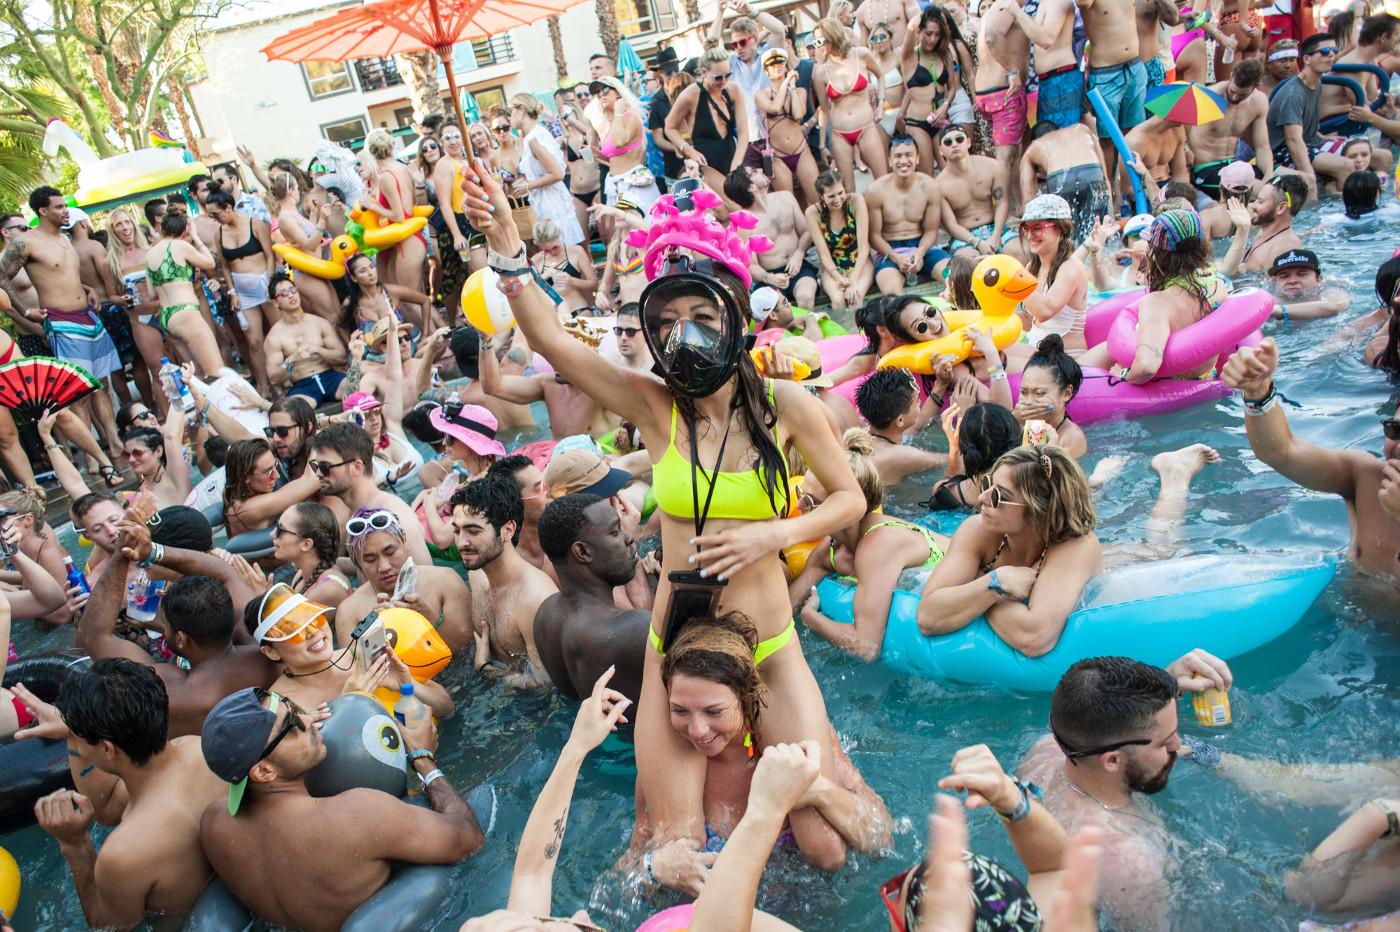 images/Splash House June 2019/Pluko fans at the Riveria on Sunday DSC_6201